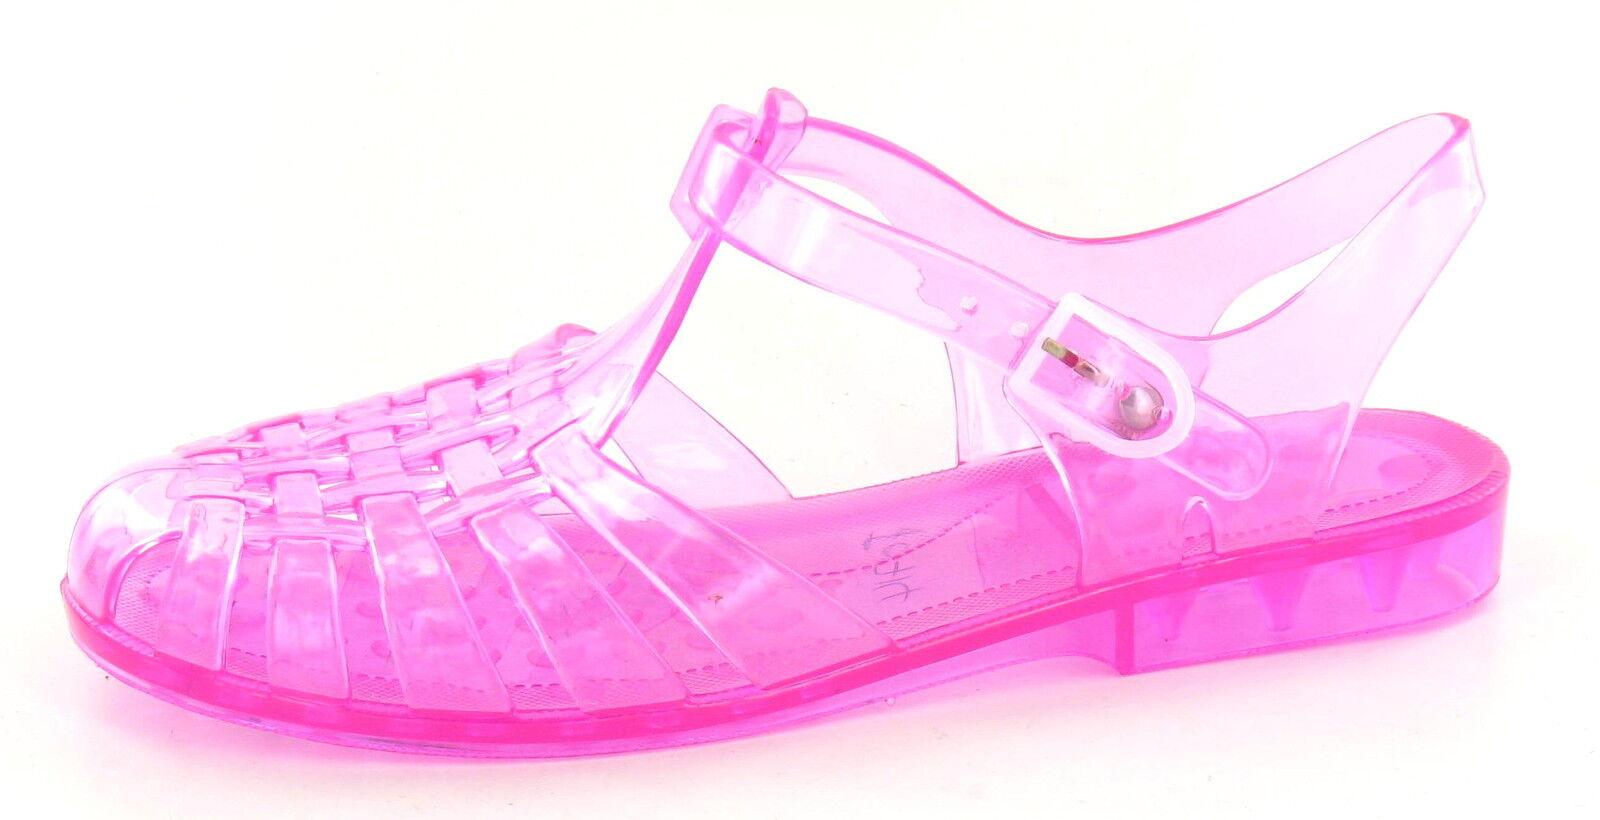 987262d7650d Ladies Spot on Jelly Sandals Label - F0714 Fuchsia 6 UK Regular for ...